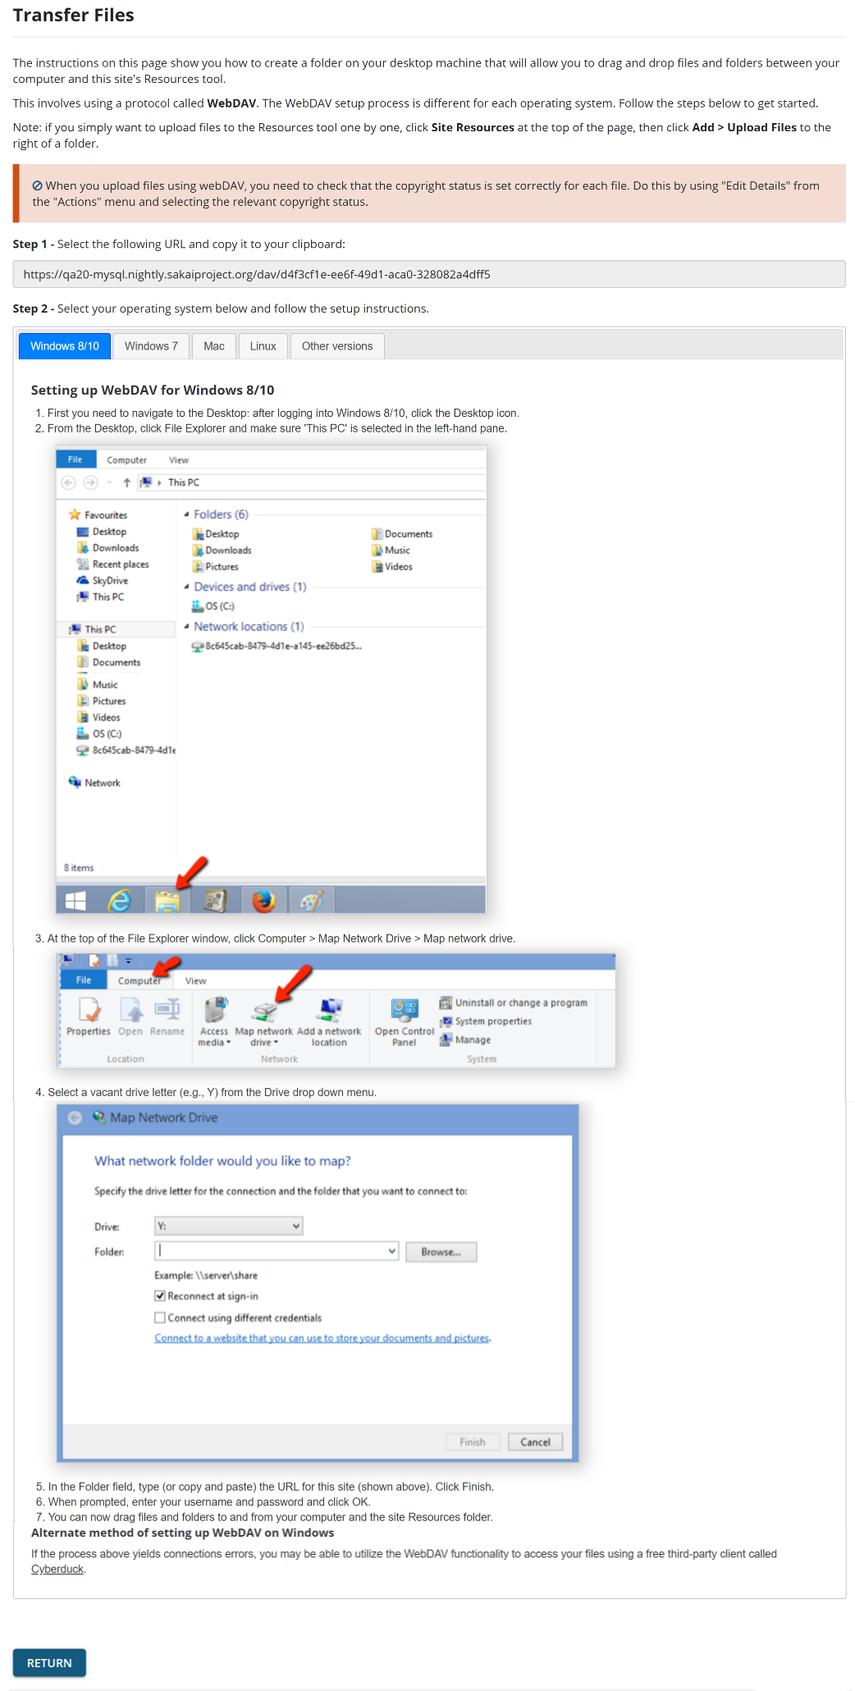 Image of the steps to set up WebDAV